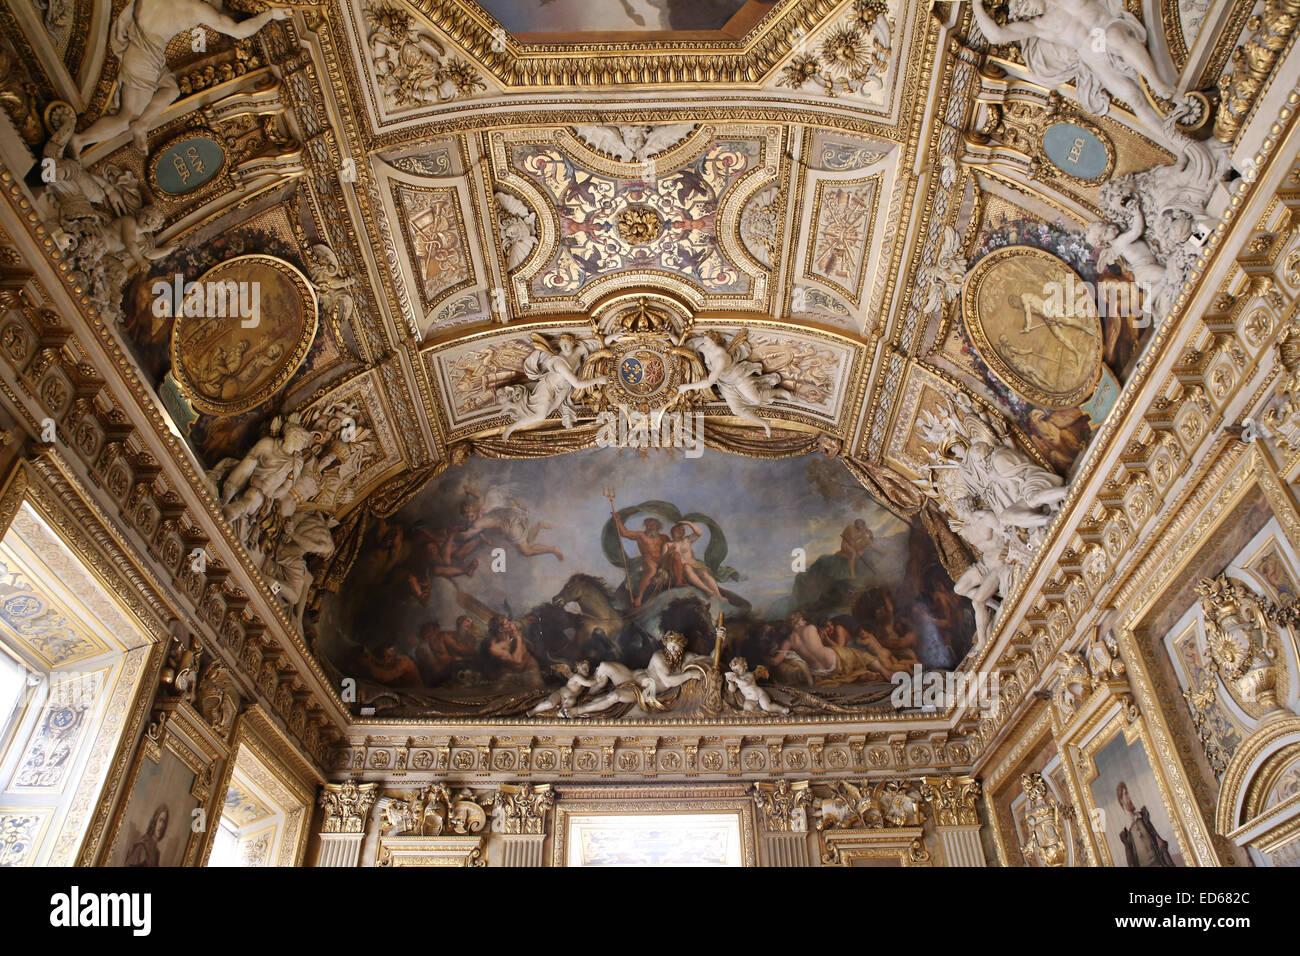 Galerie d'Apollon ceiling Louvre - Stock Image